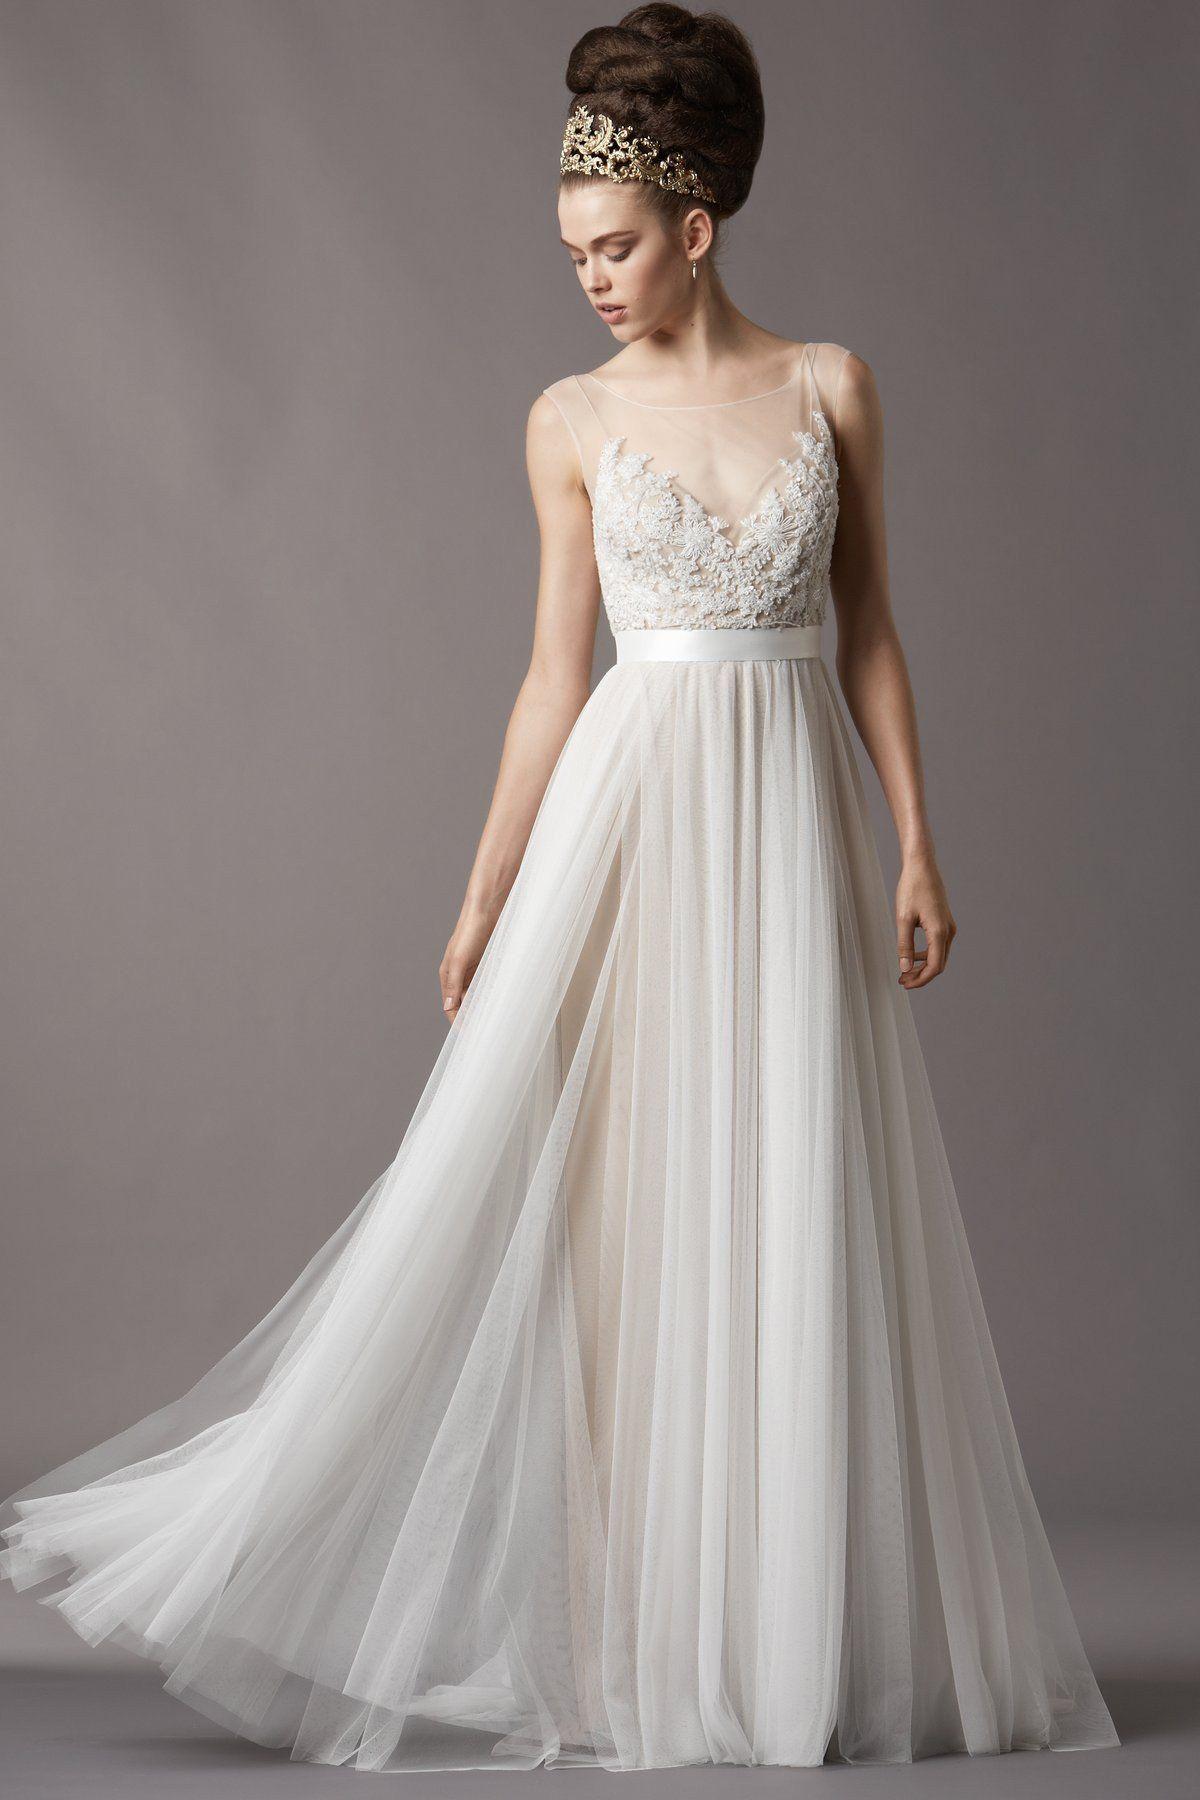 Watters Jacinda From Luxeredux Bridal Watters Wedding Dress Wedding Dress Sizes Wedding Dresses